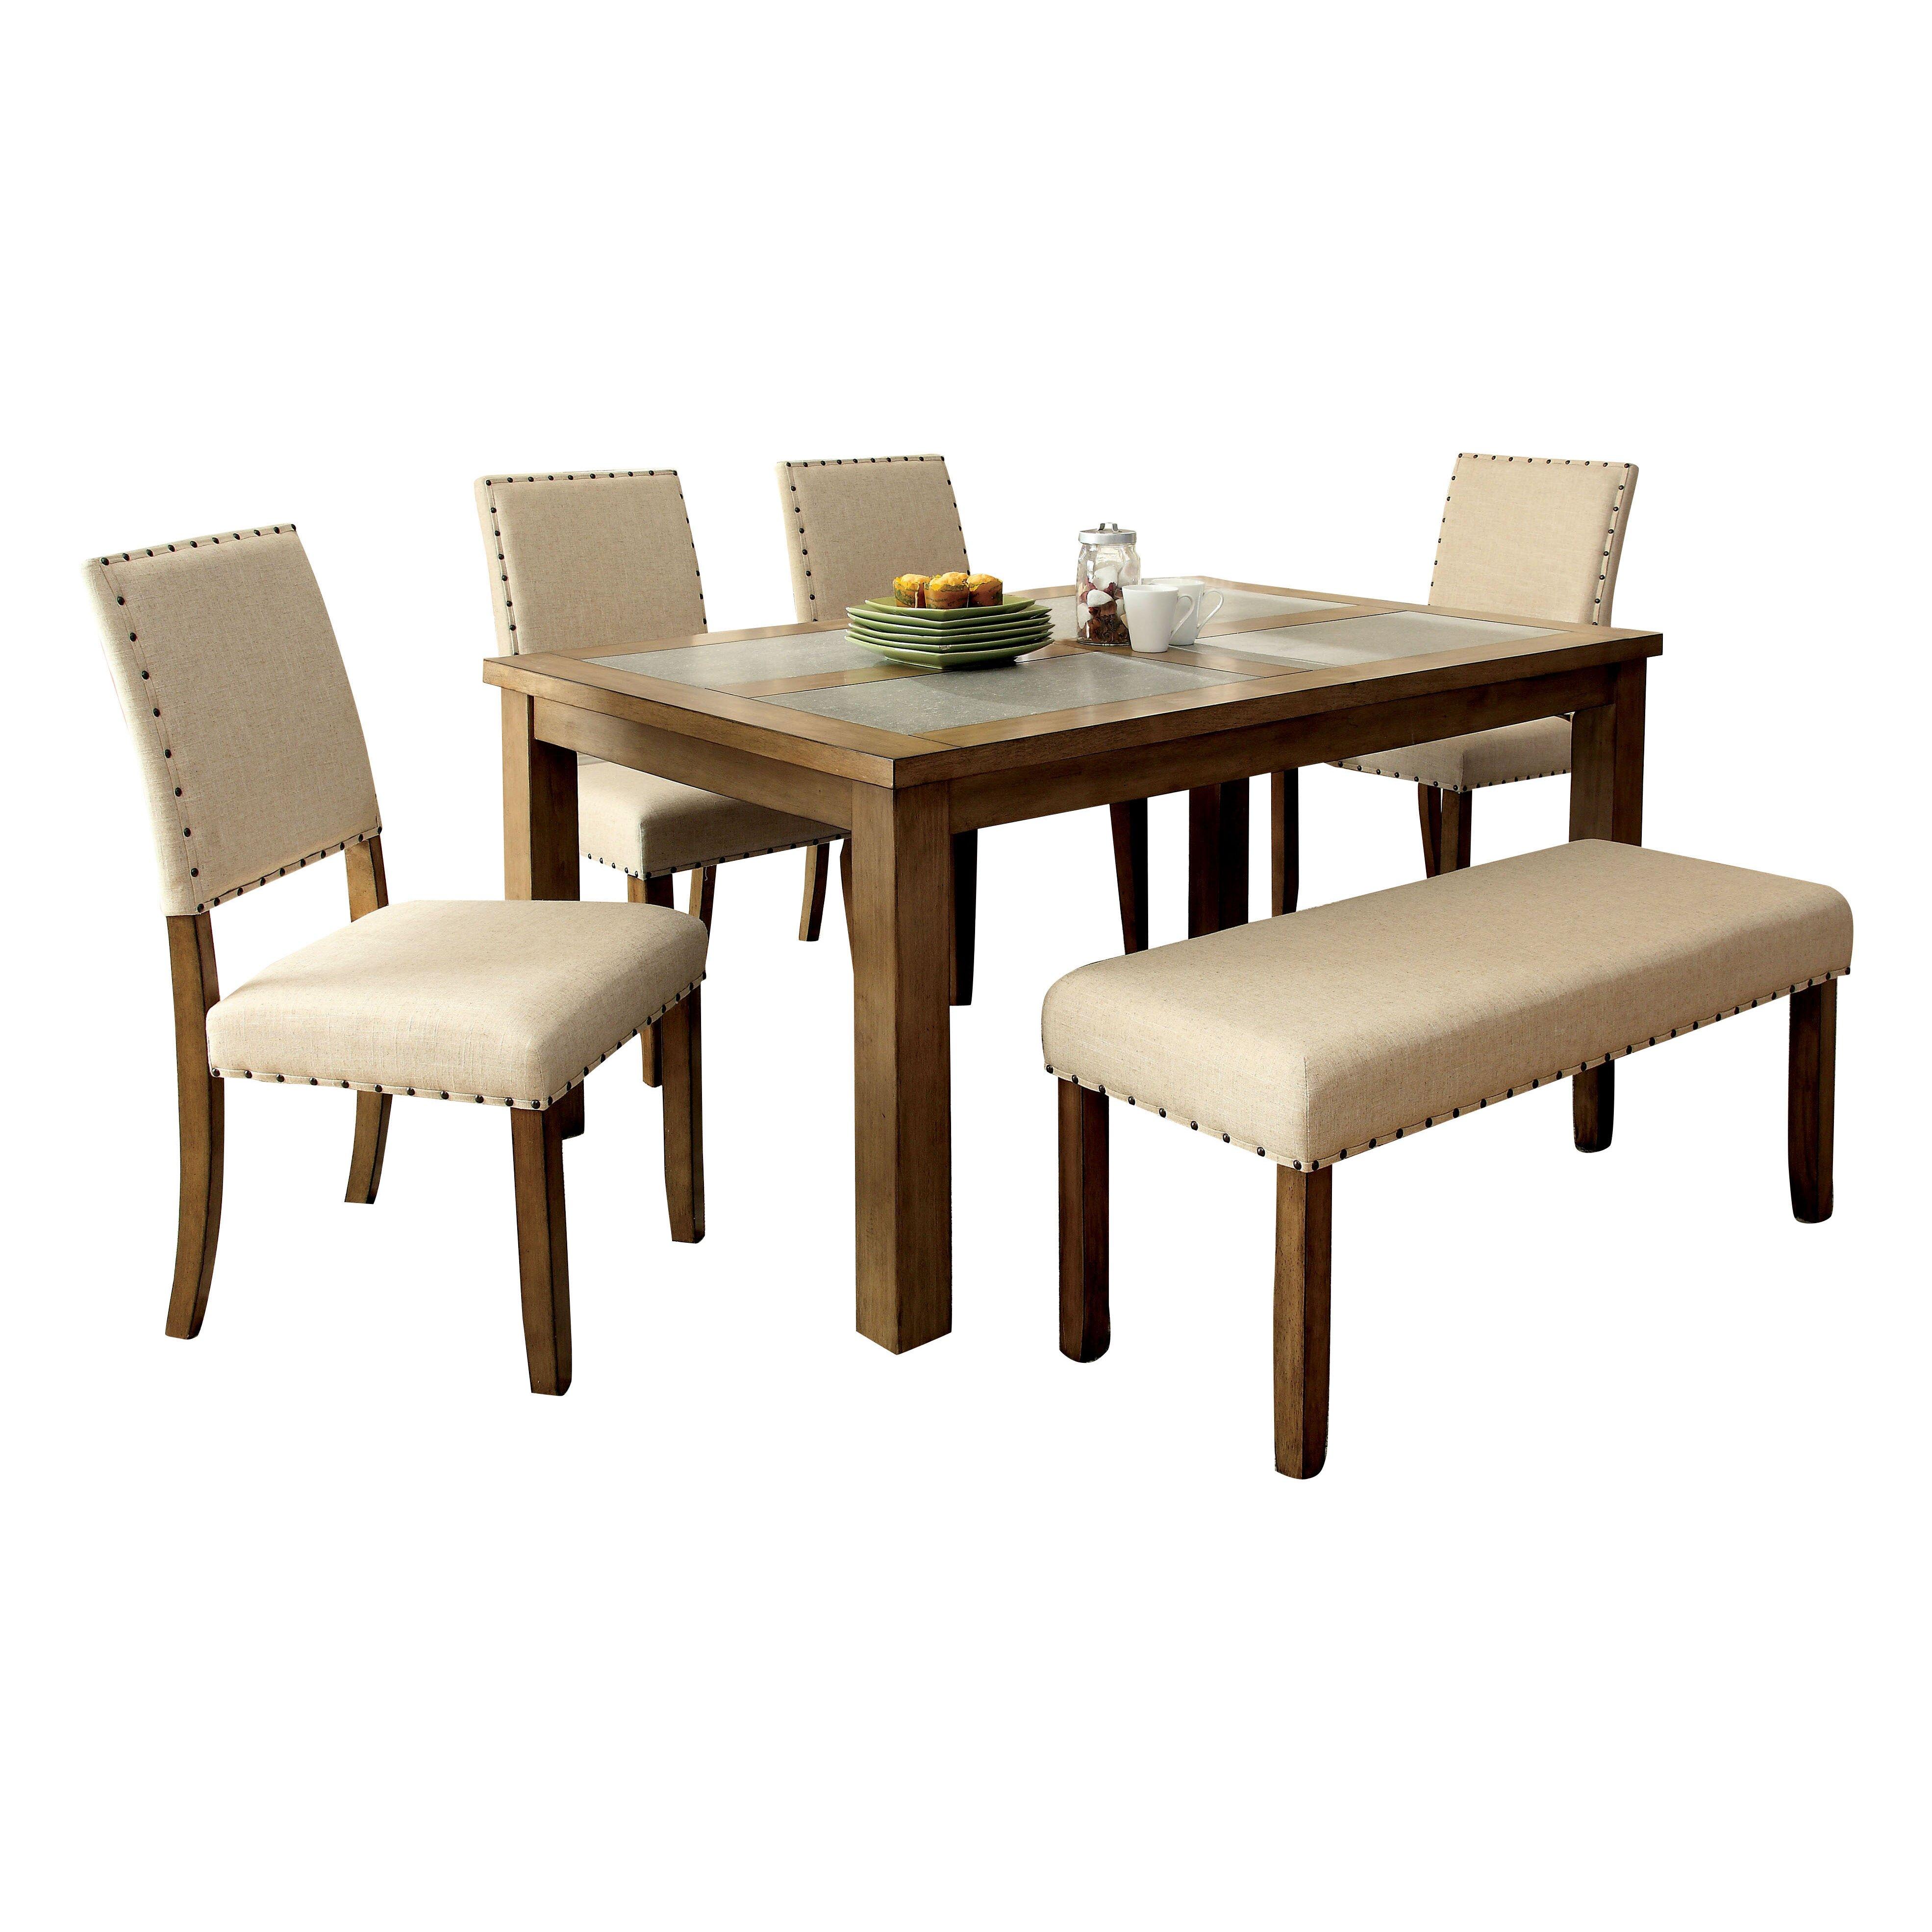 Hokku designs casiodoro 6 piece dining set reviews wayfair for Hokku designs dining room furniture